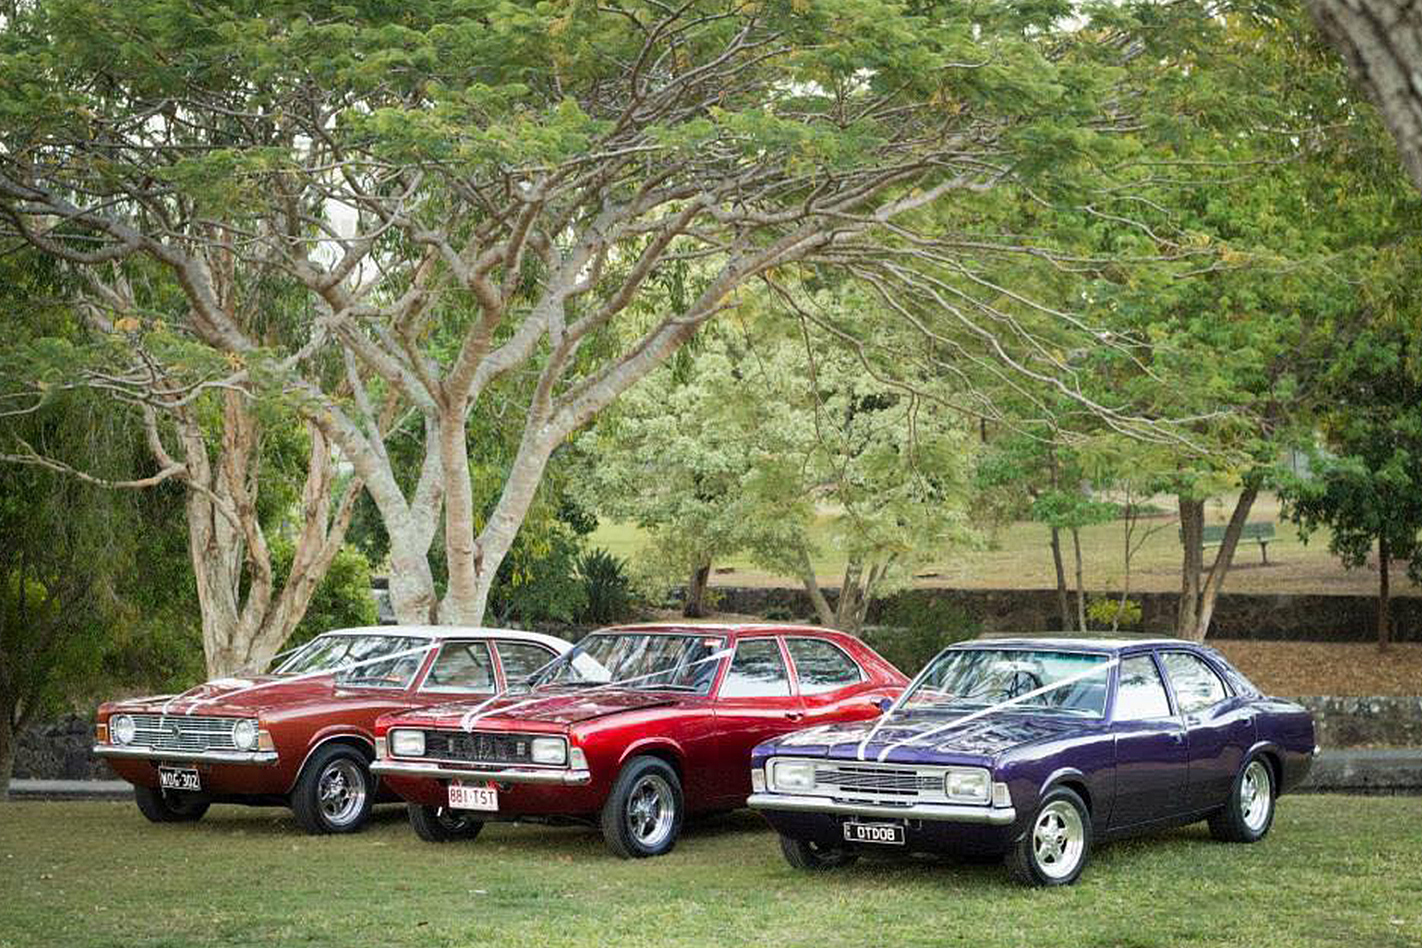 Darren McClure's wedding cars